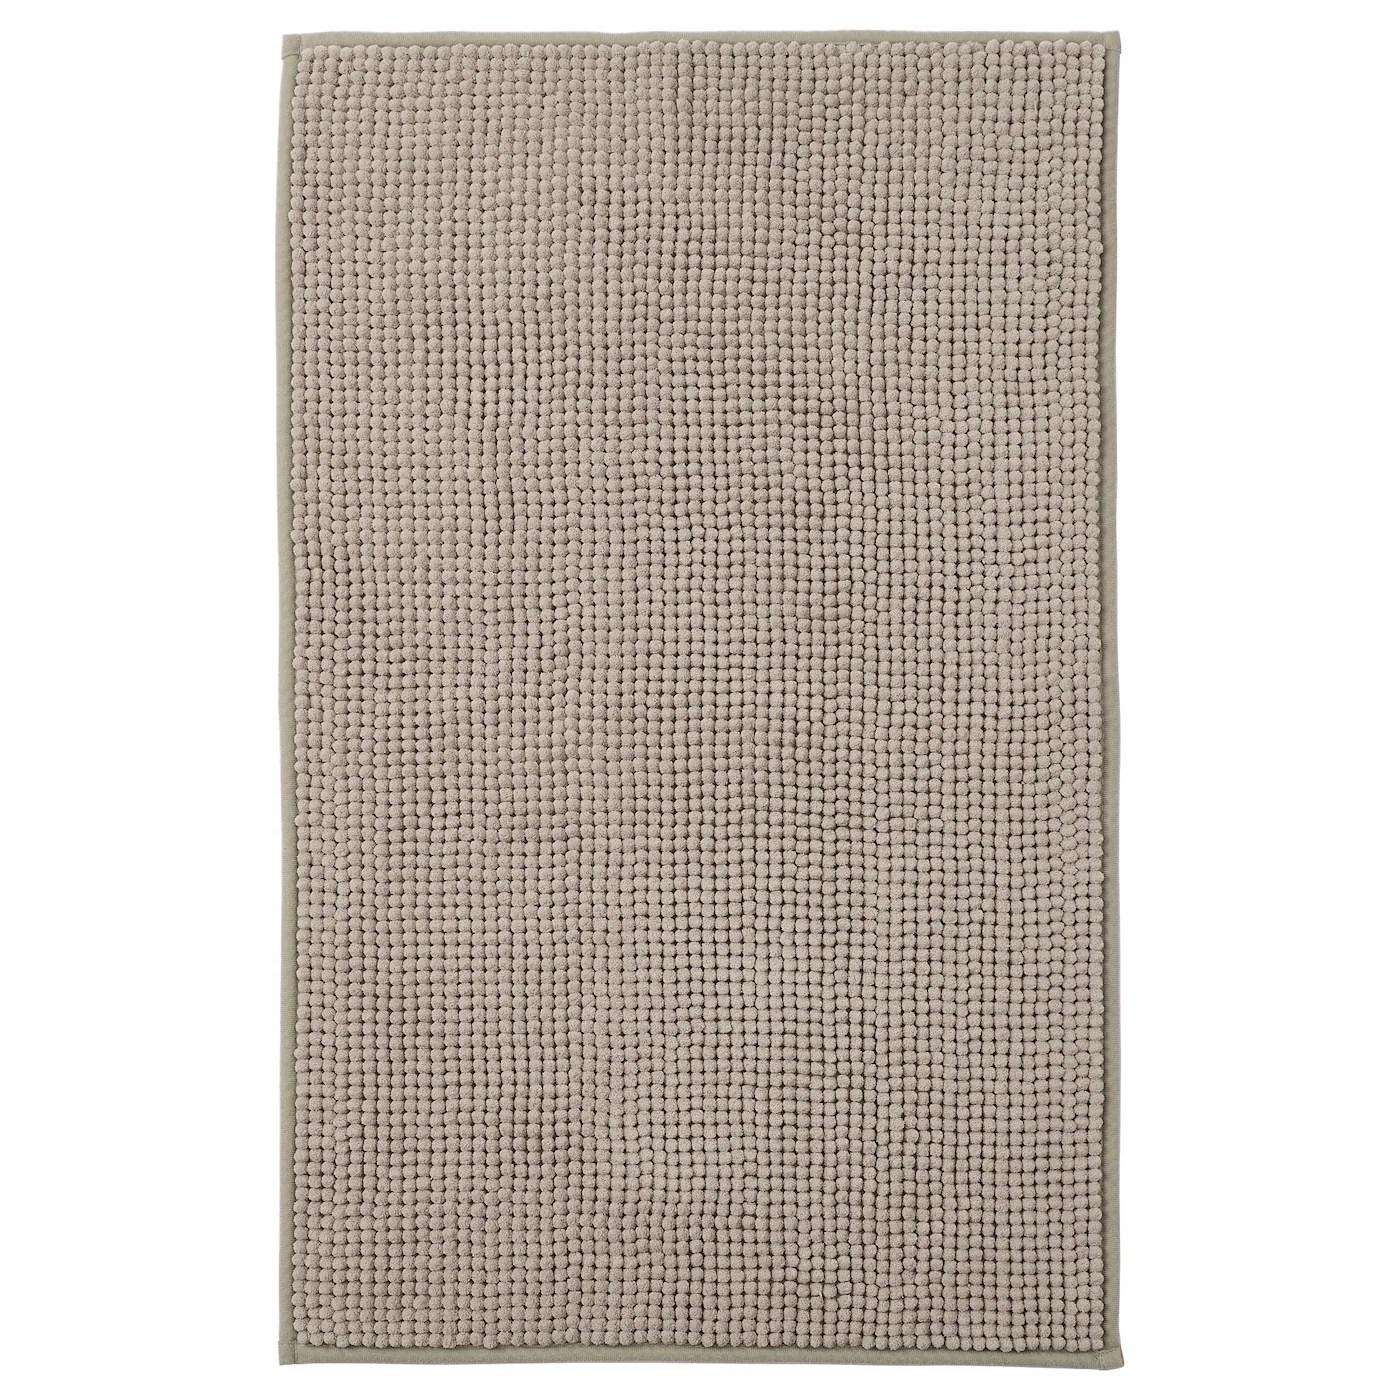 toftbo tapis de bain beige fonce 50x80 cm